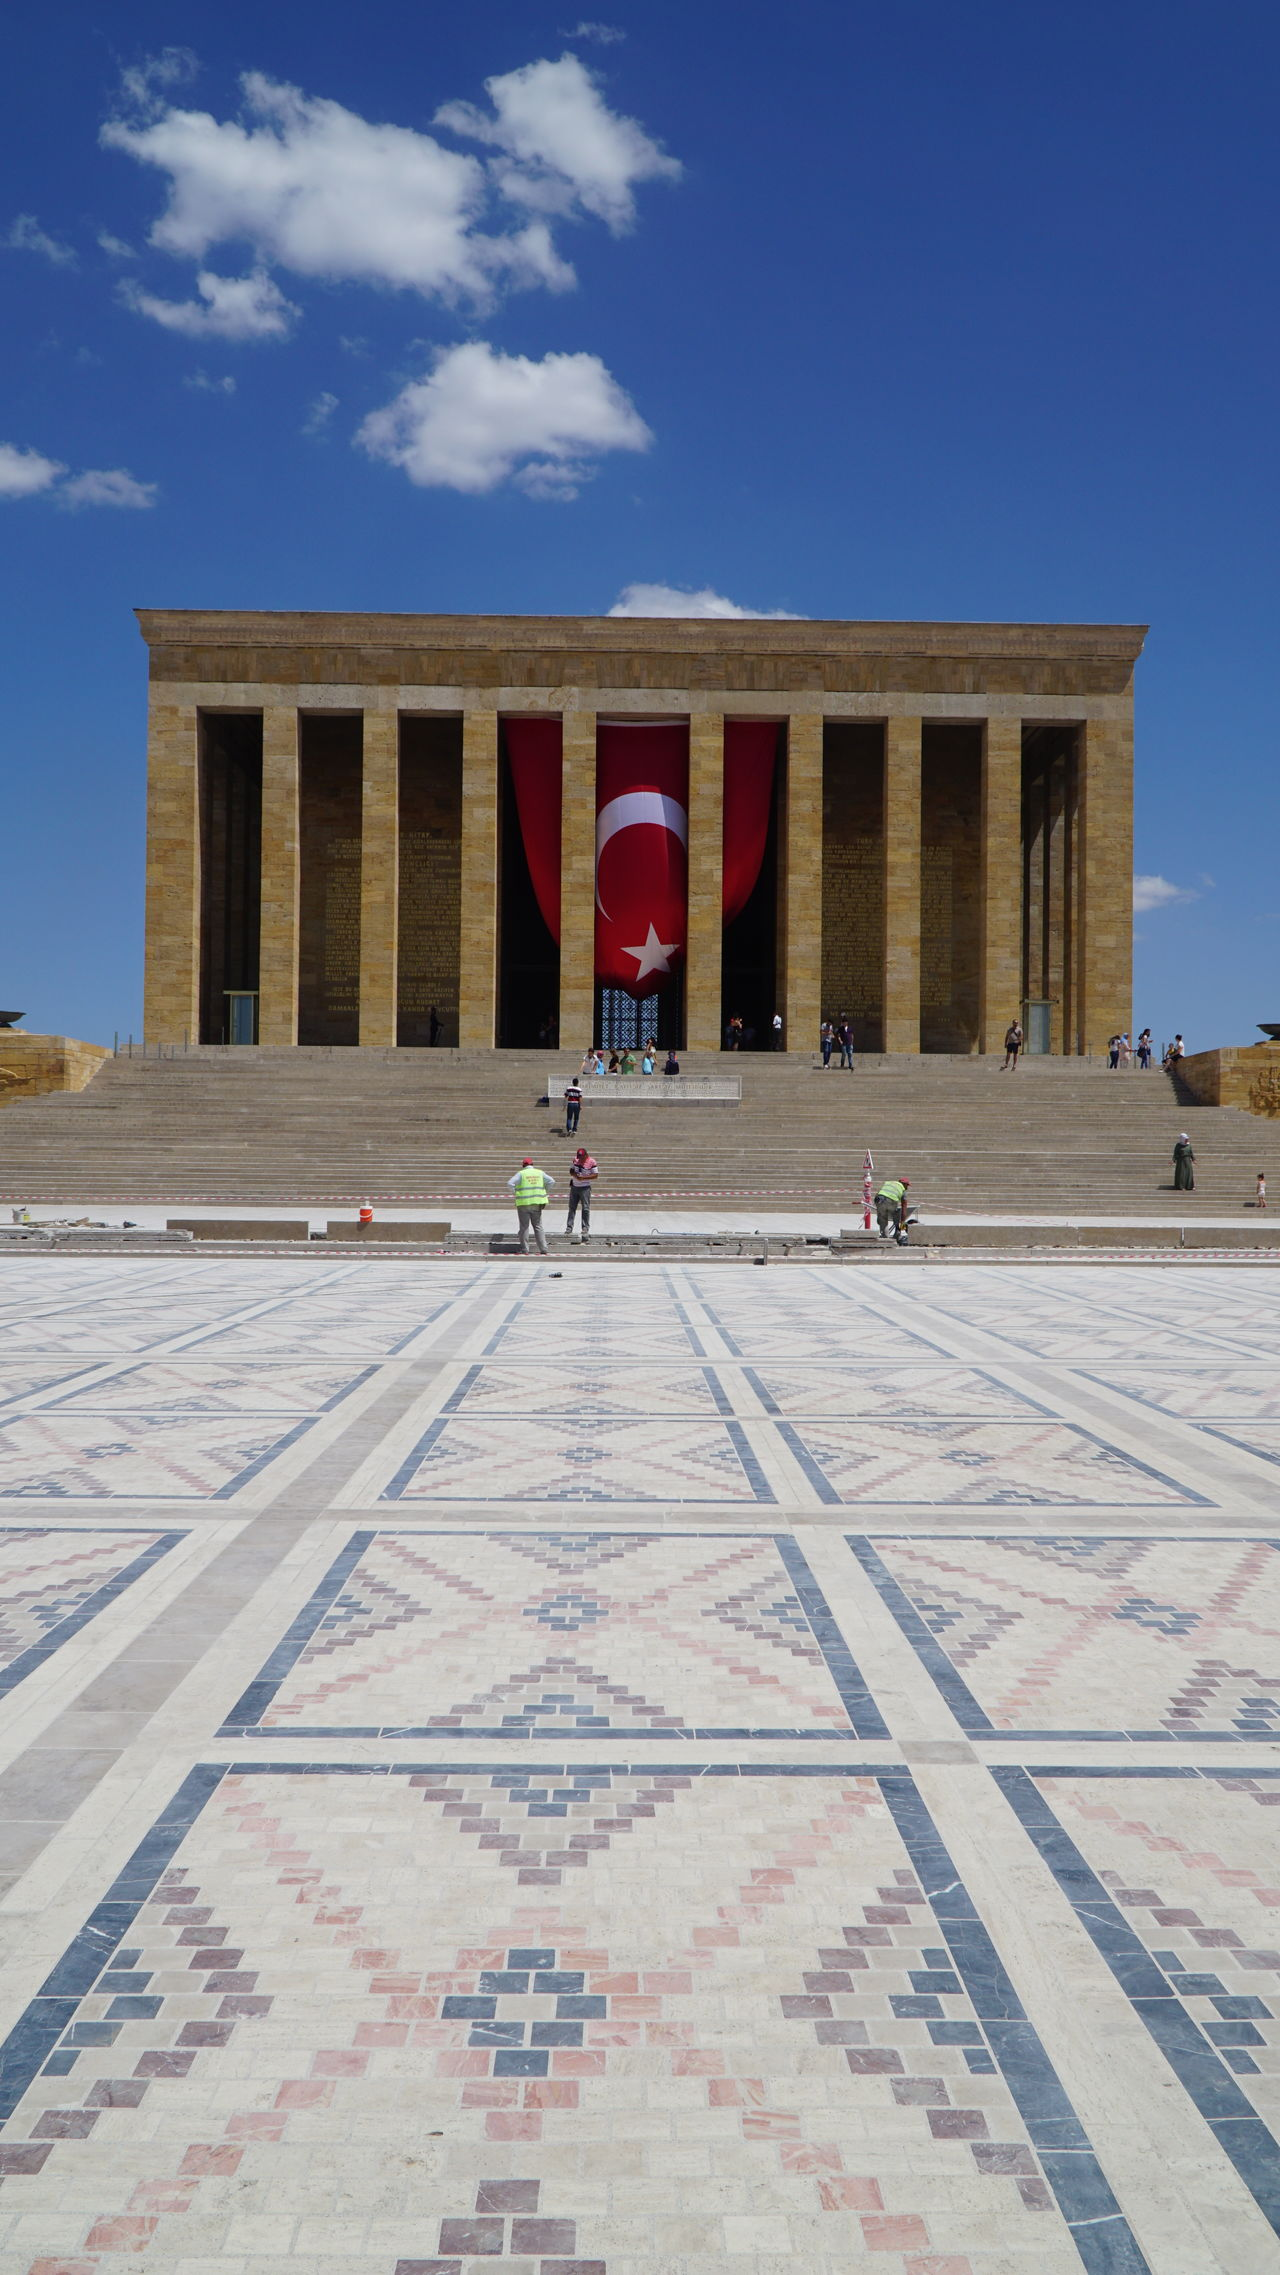 Anıtkabir Architecture Atatürk Famous Place Sky Travel Destinations Turkey Türkiye